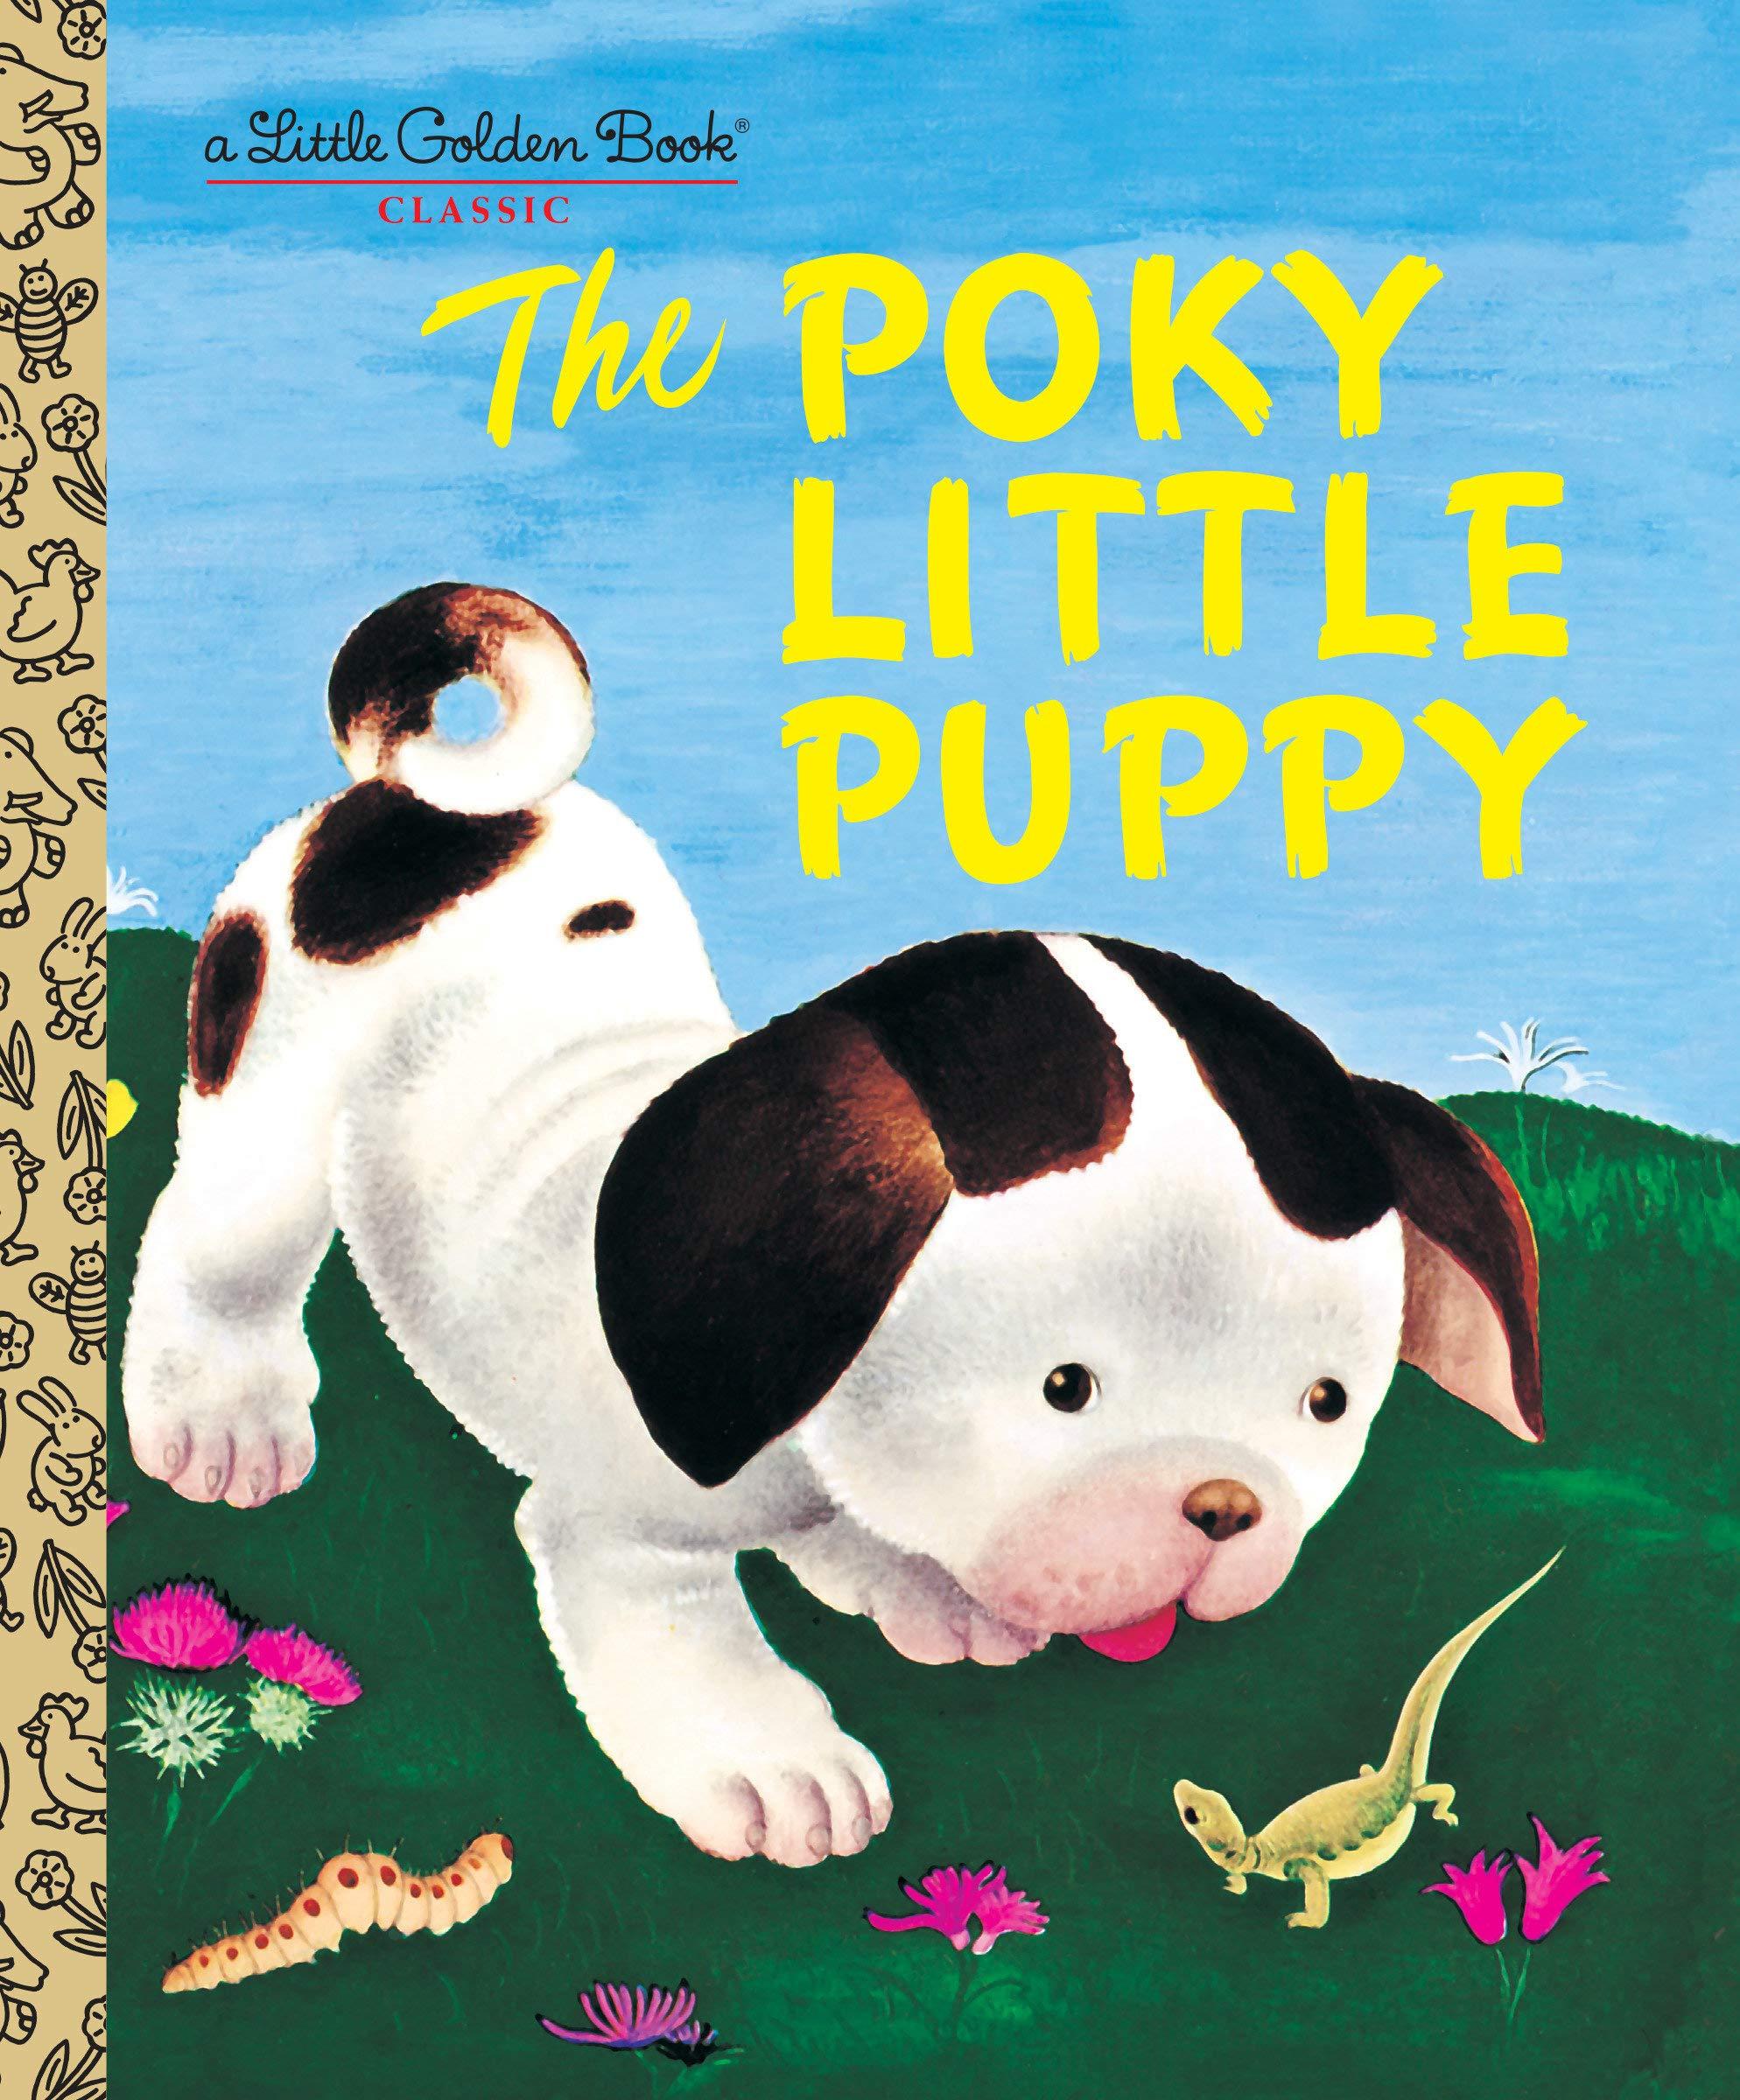 The Poky Little Puppy (A Little Golden Book Classic): Sebring Lowrey, Janette, Tenggren, Gustaf: 9780307021342: Amazon.com: Books